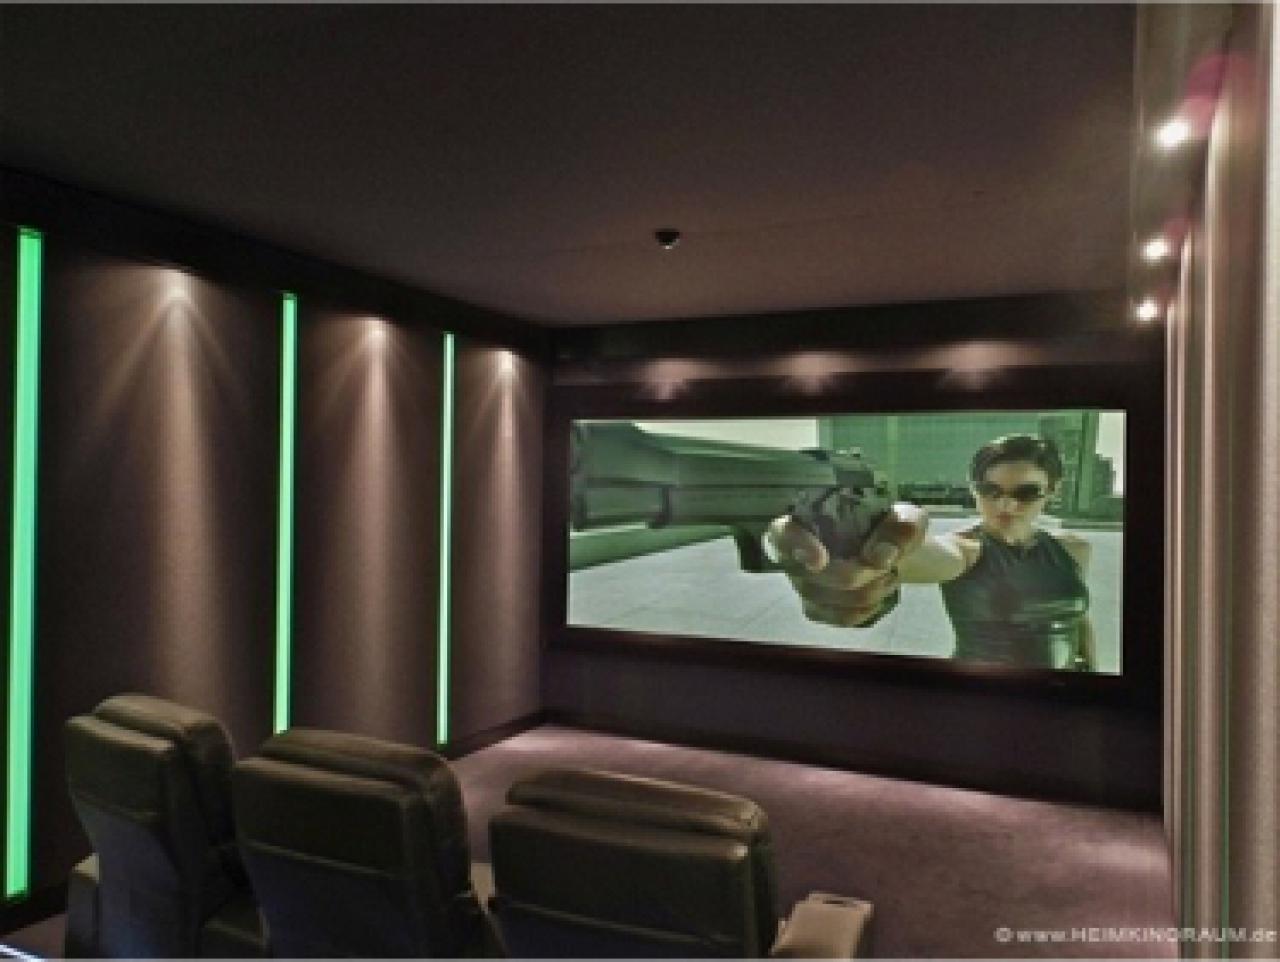 heimkino selber bauen. free tv wand mit kino feeling selber machen